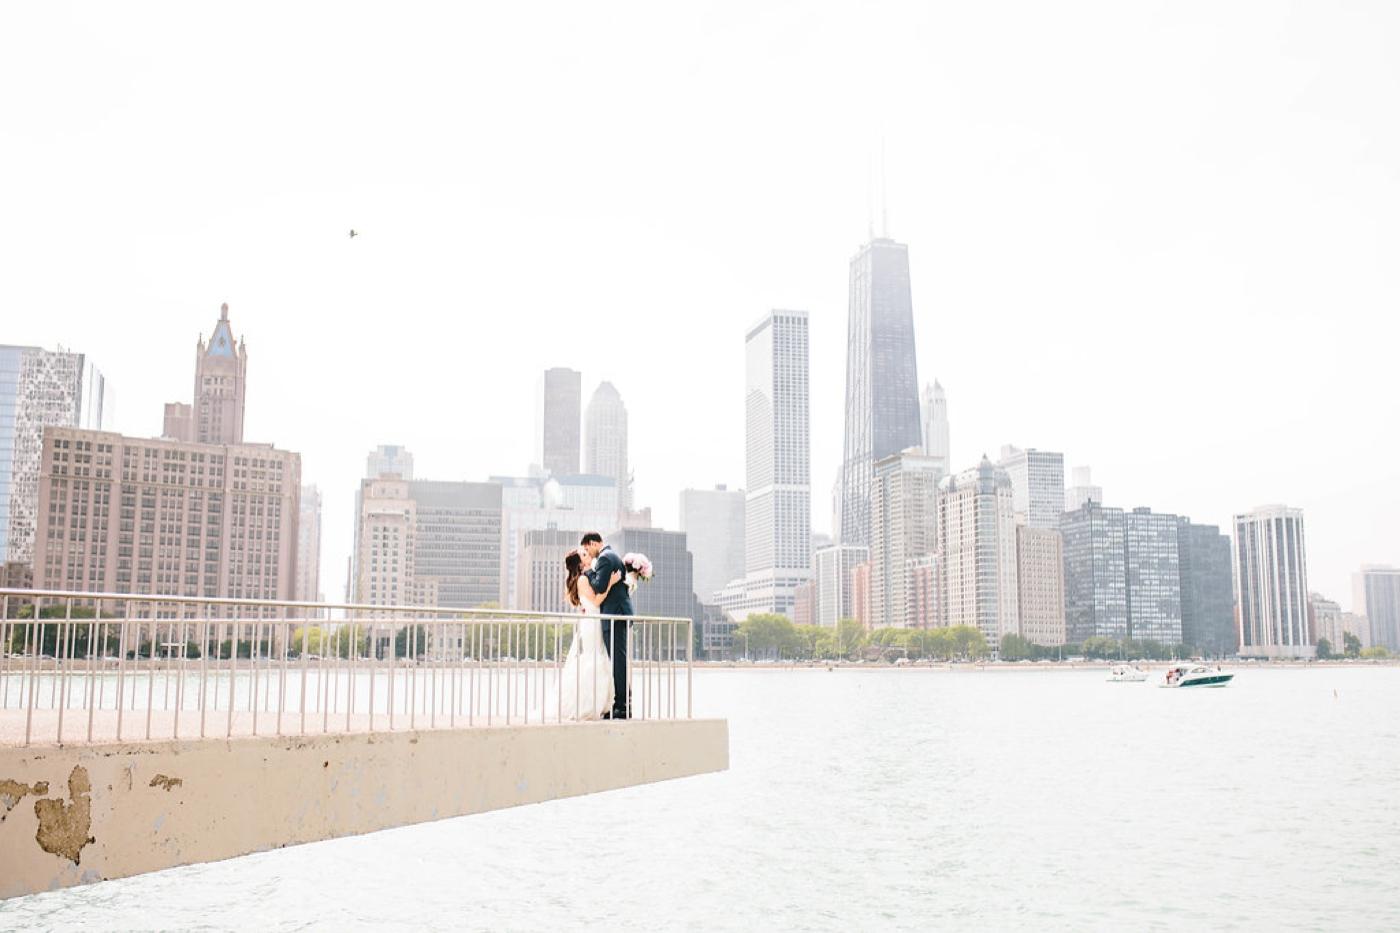 chicago-fine-art-wedding-photography-sakamuri34